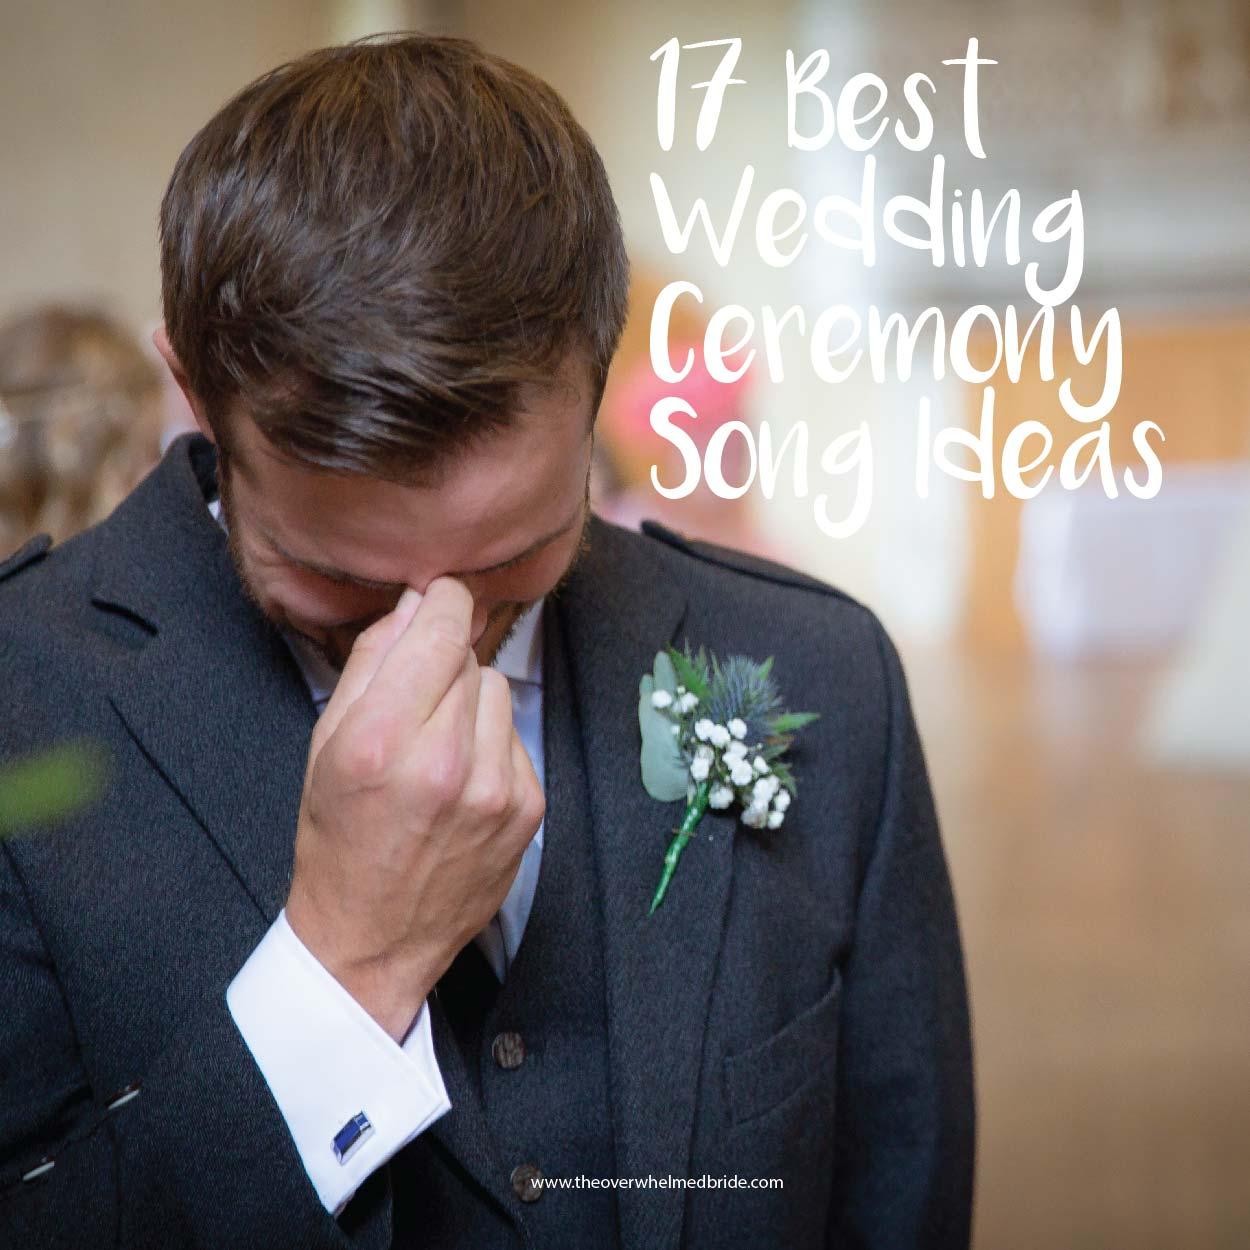 Wedding Ceremony Song Ideas